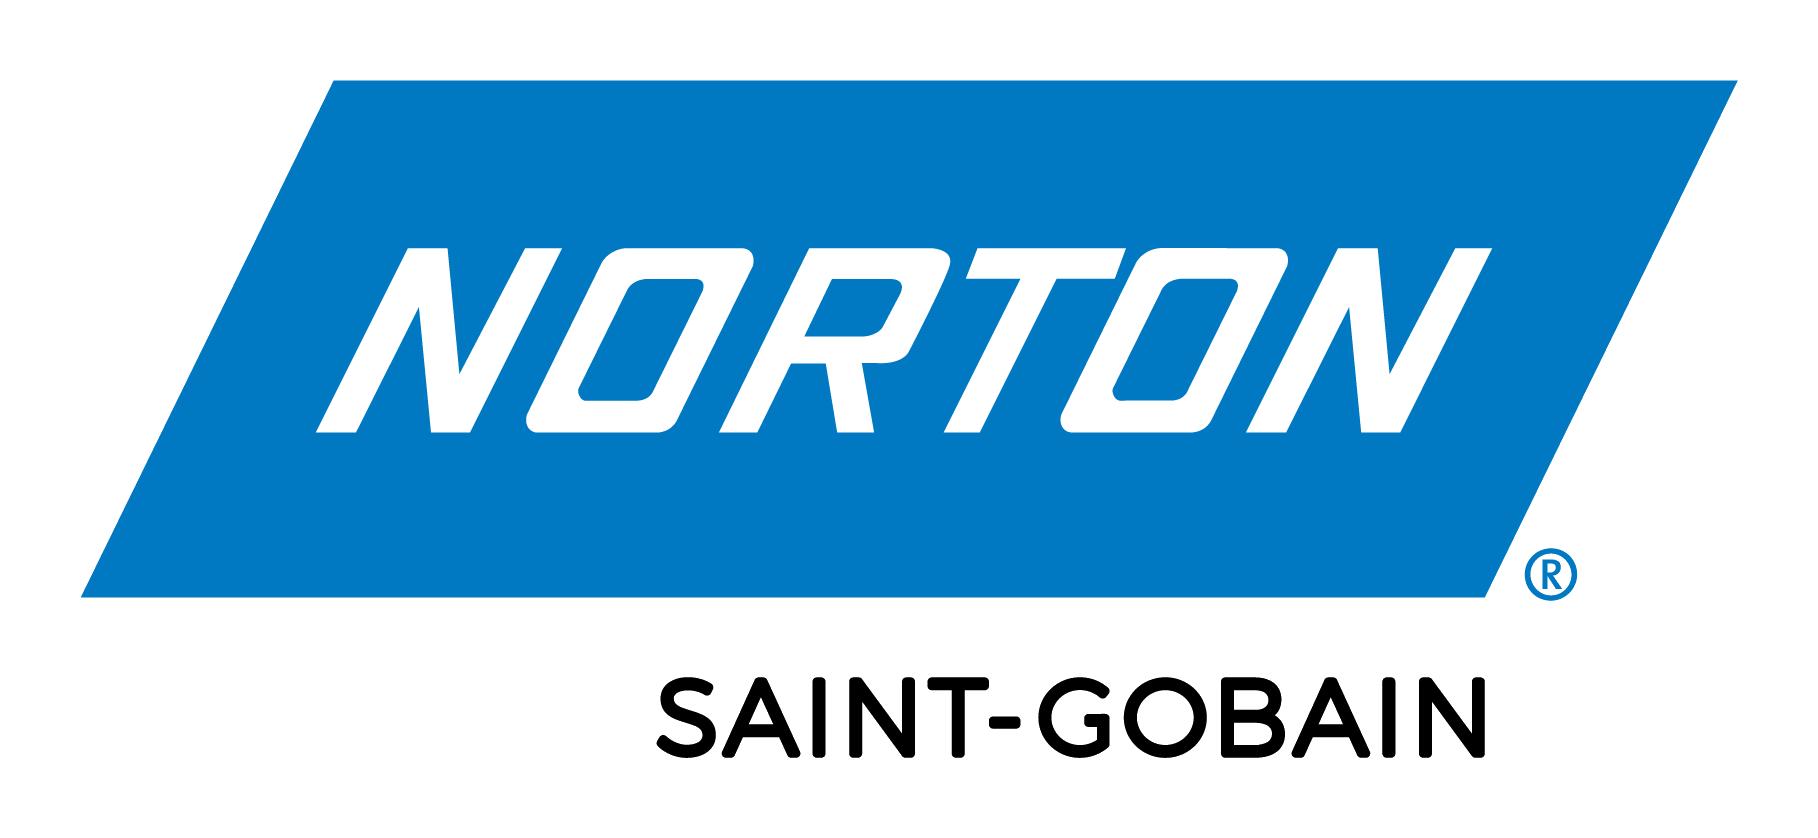 SG_Norton_logo_rgb_1